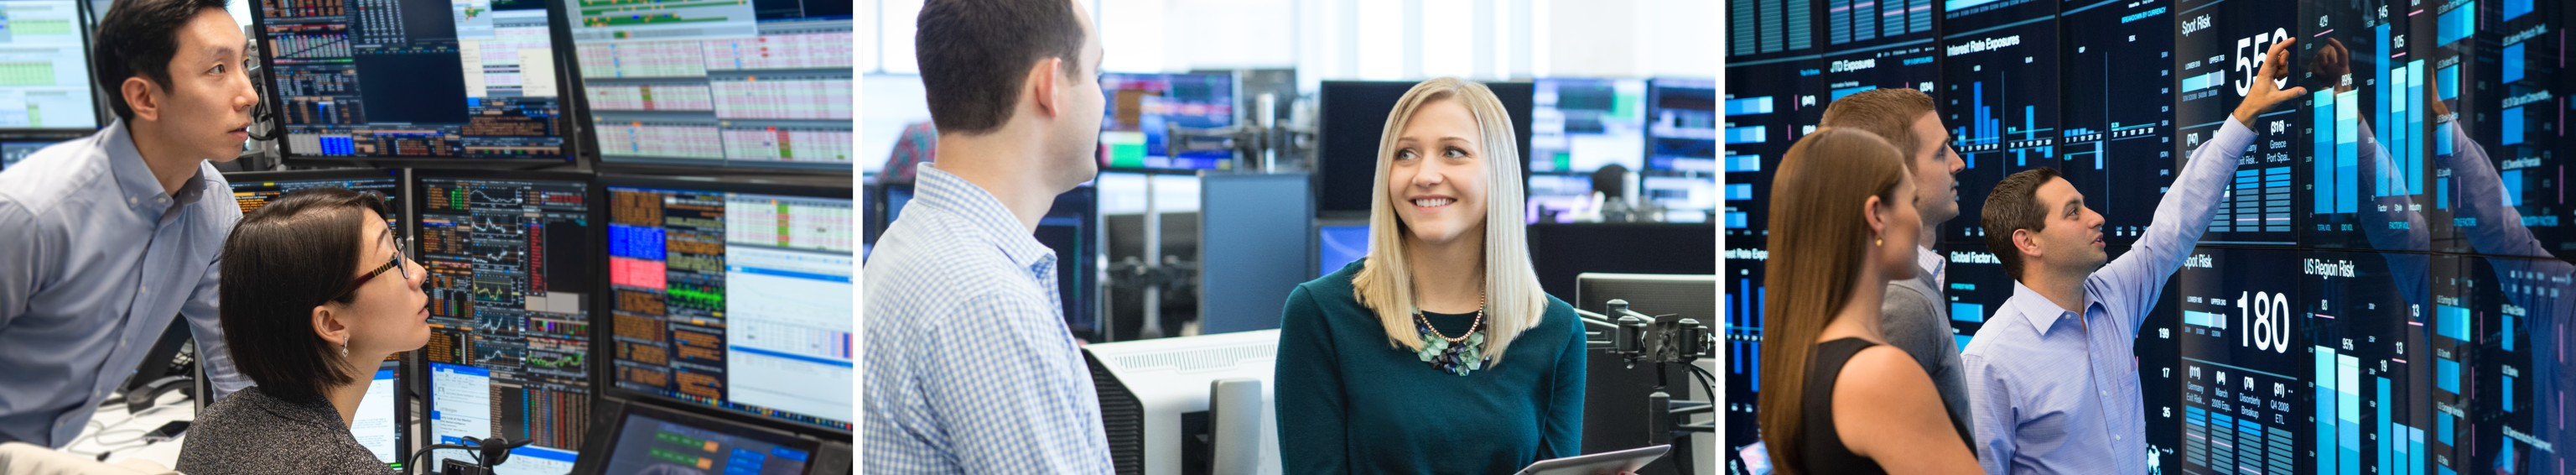 Citadel Securities | LinkedIn